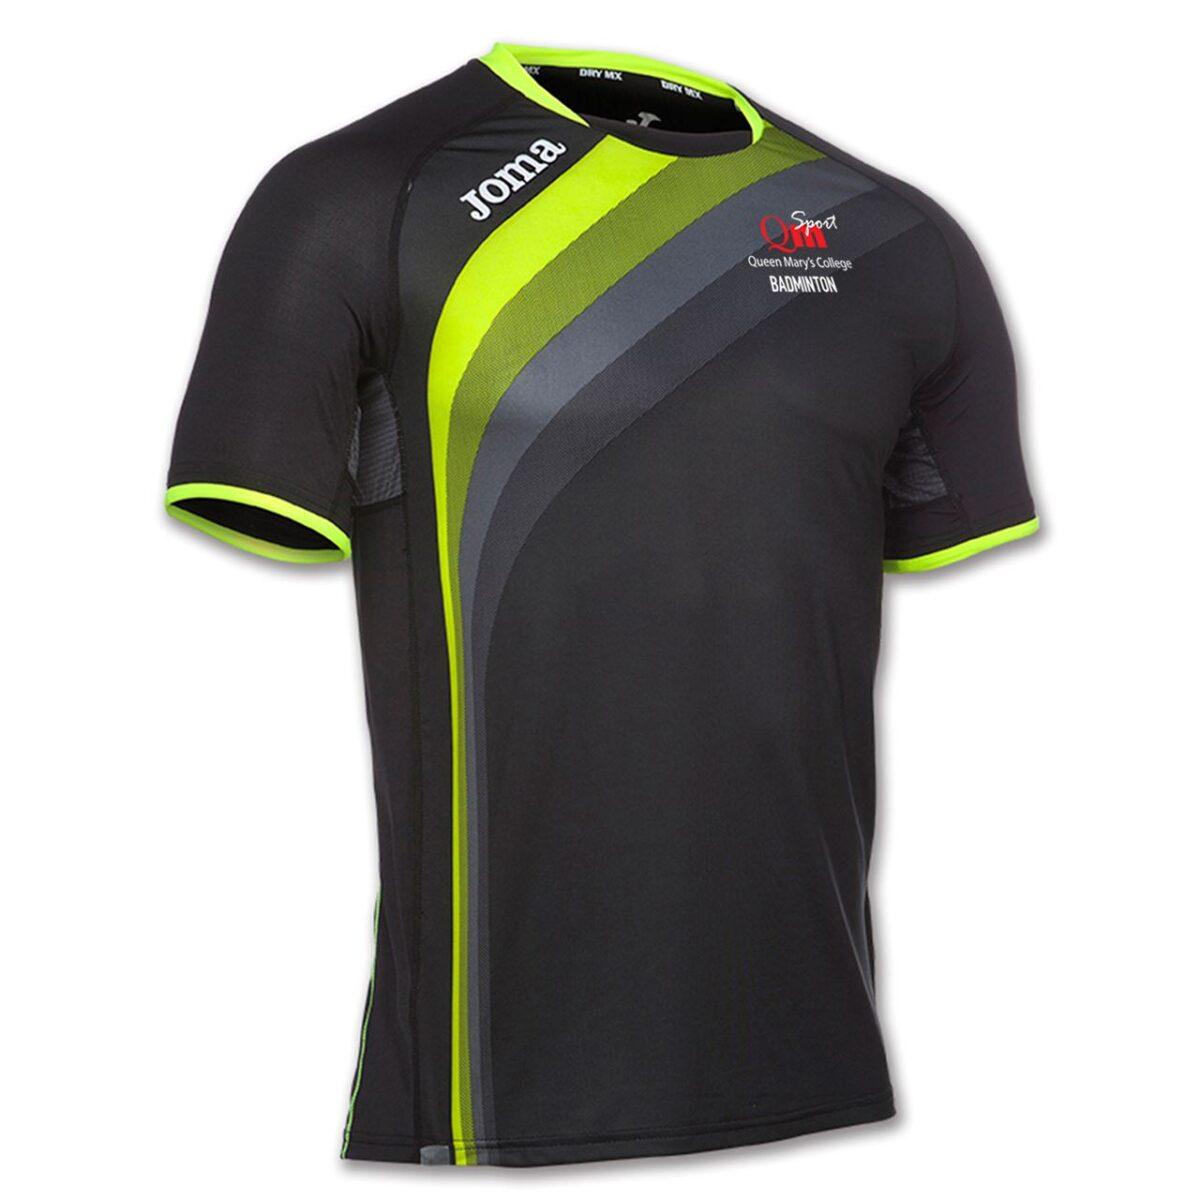 QMC Badminton Mens Short Sleeve Black/Yellow T Shirt  100393.121